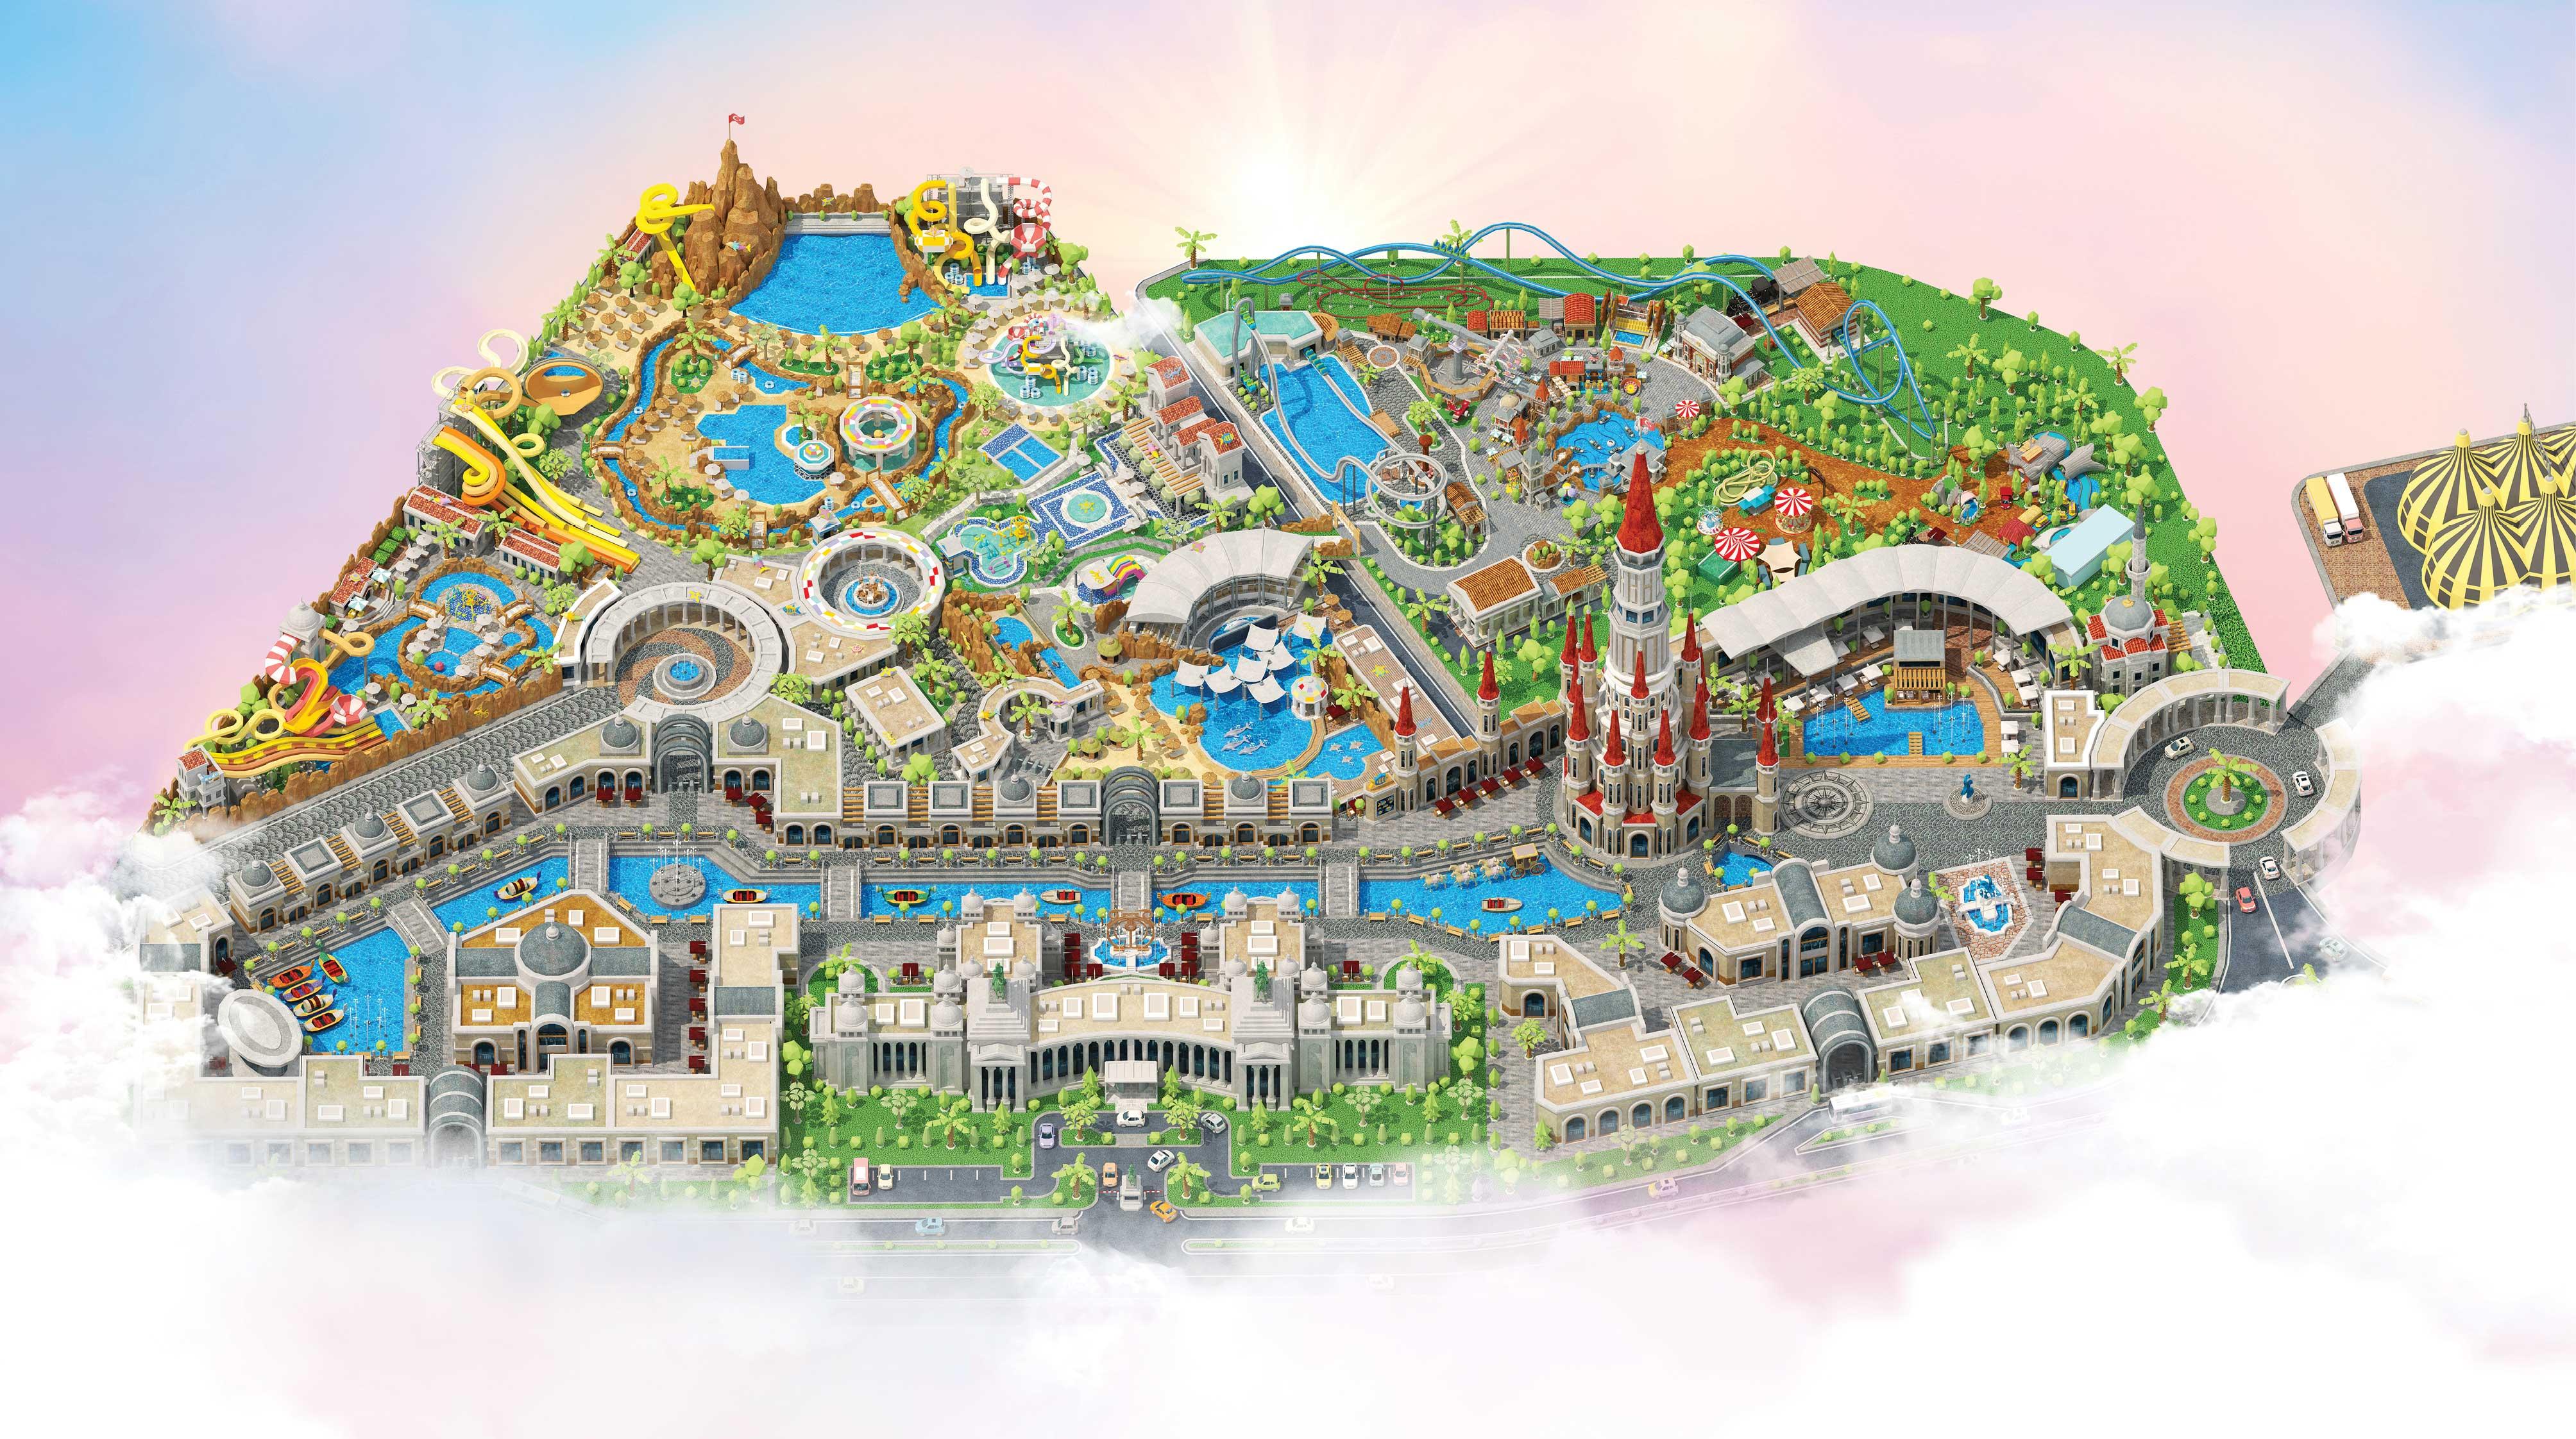 Themenpark Landkarte